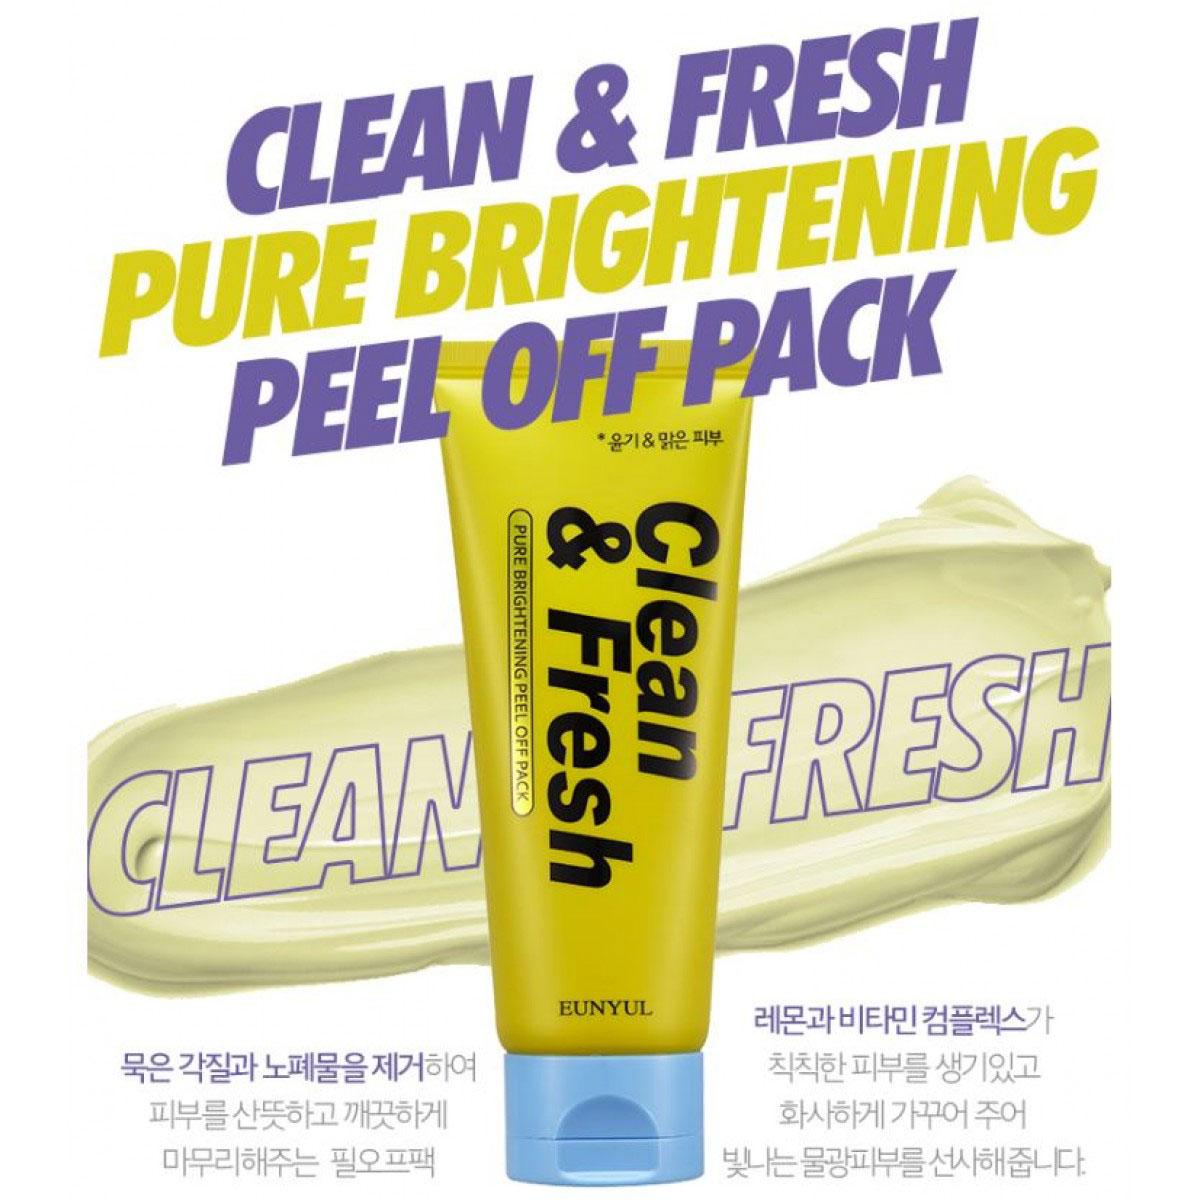 EUNYUL Clean & Fresh Pure Brightening Peel Off Pack